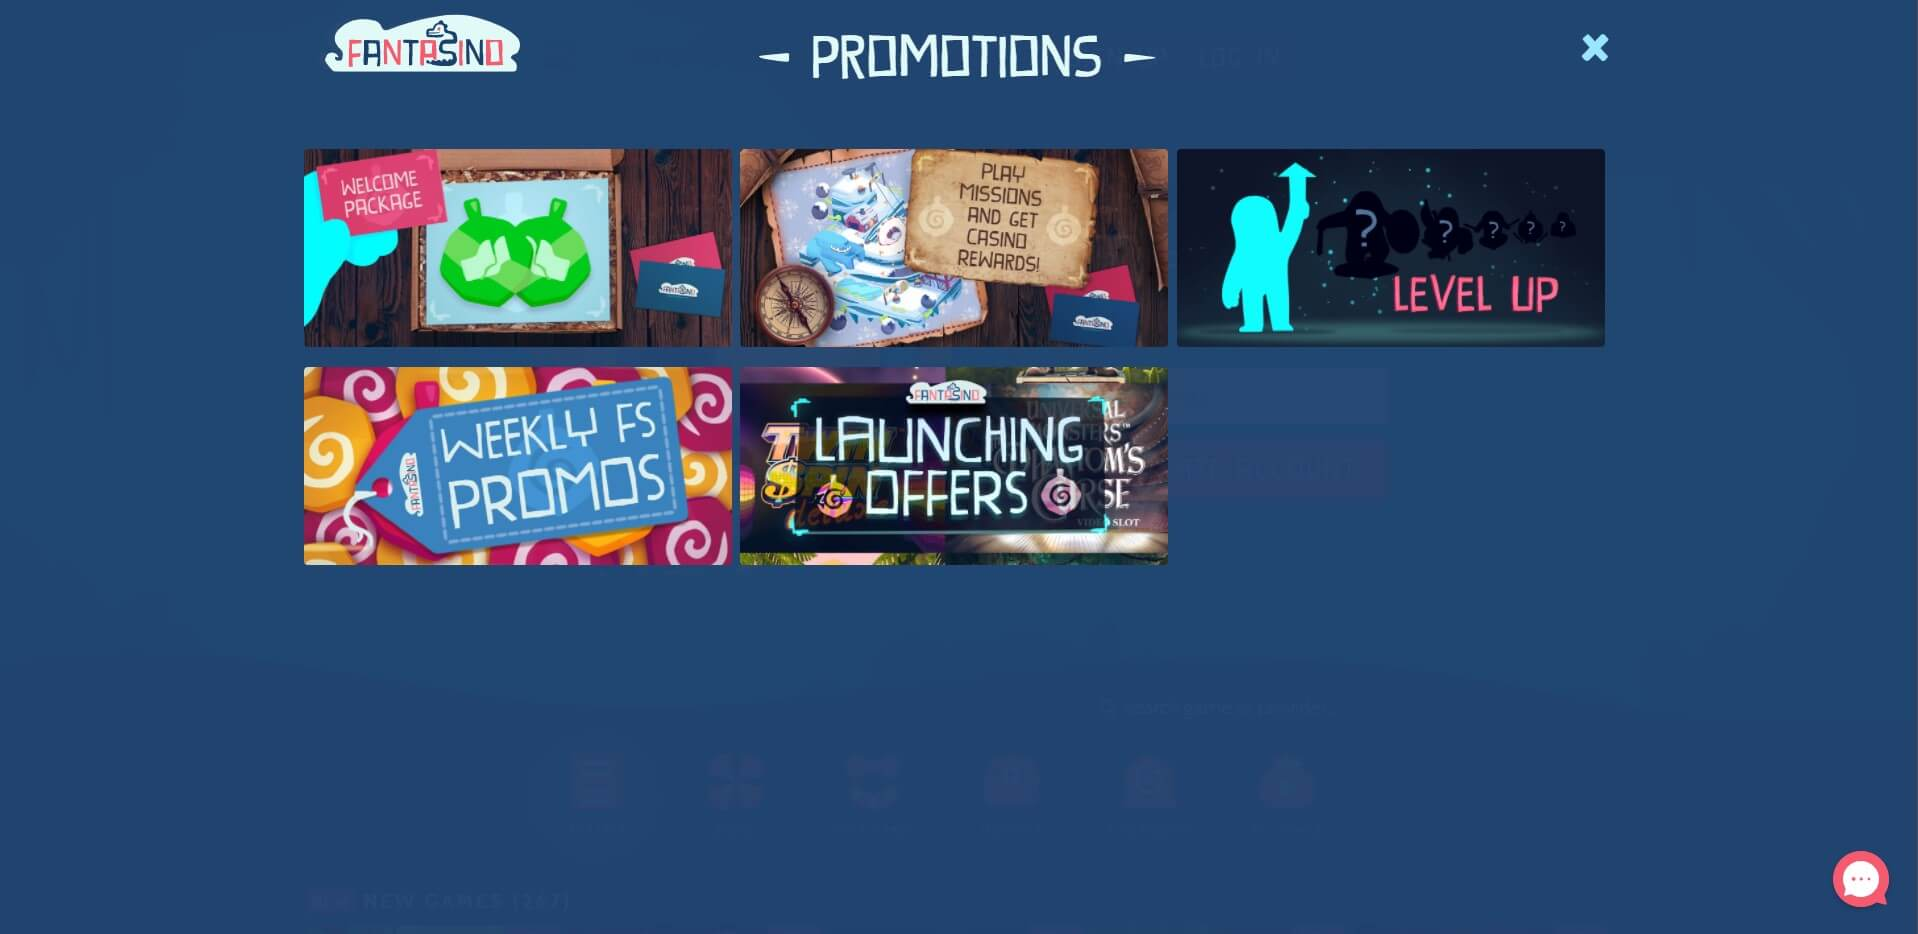 Promotions at Fantasino Casino